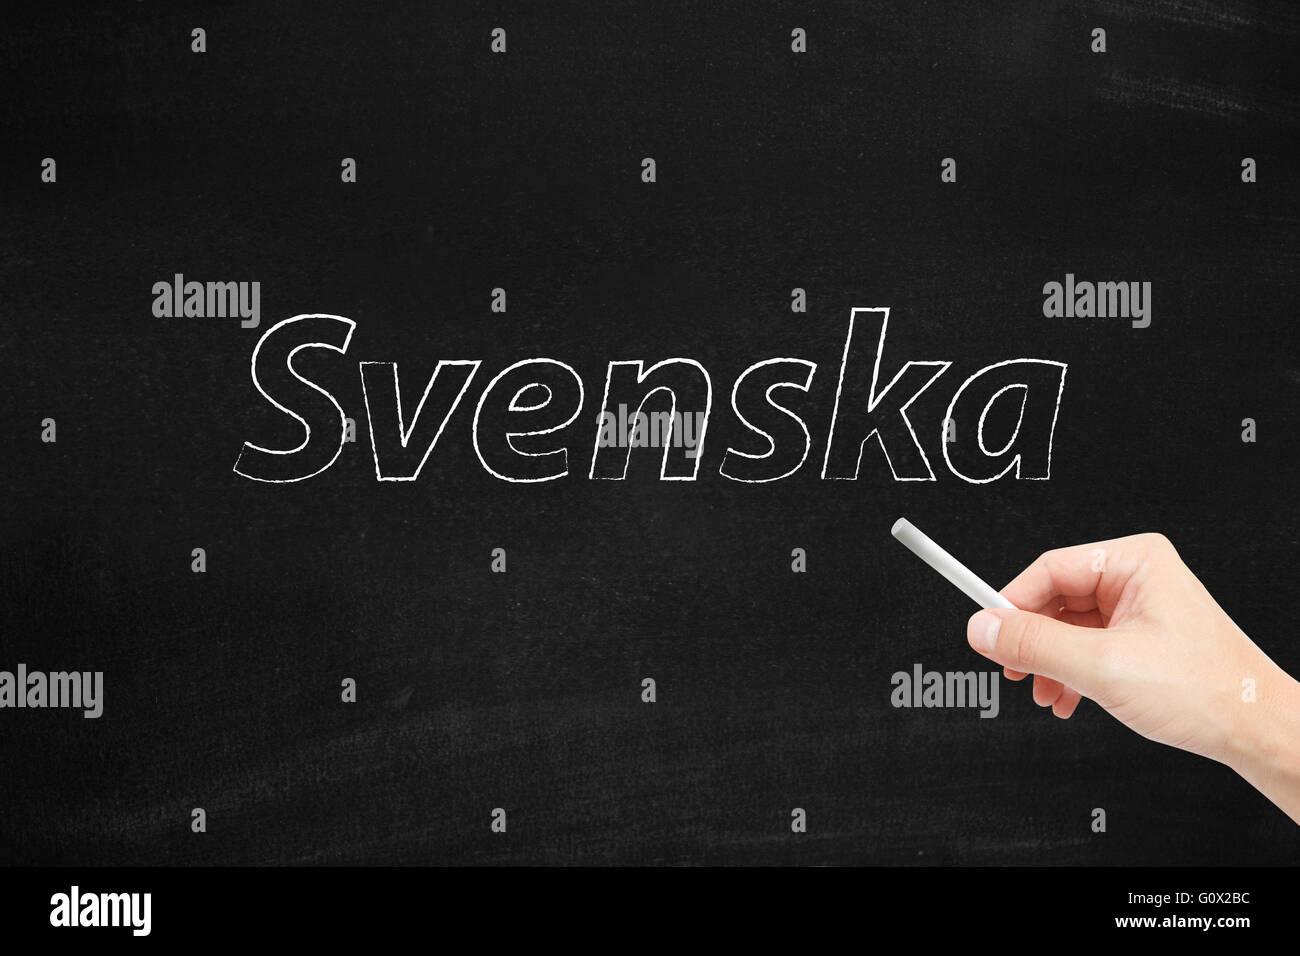 The language of Sweden, Svenska, written on a blackboard - Stock Image